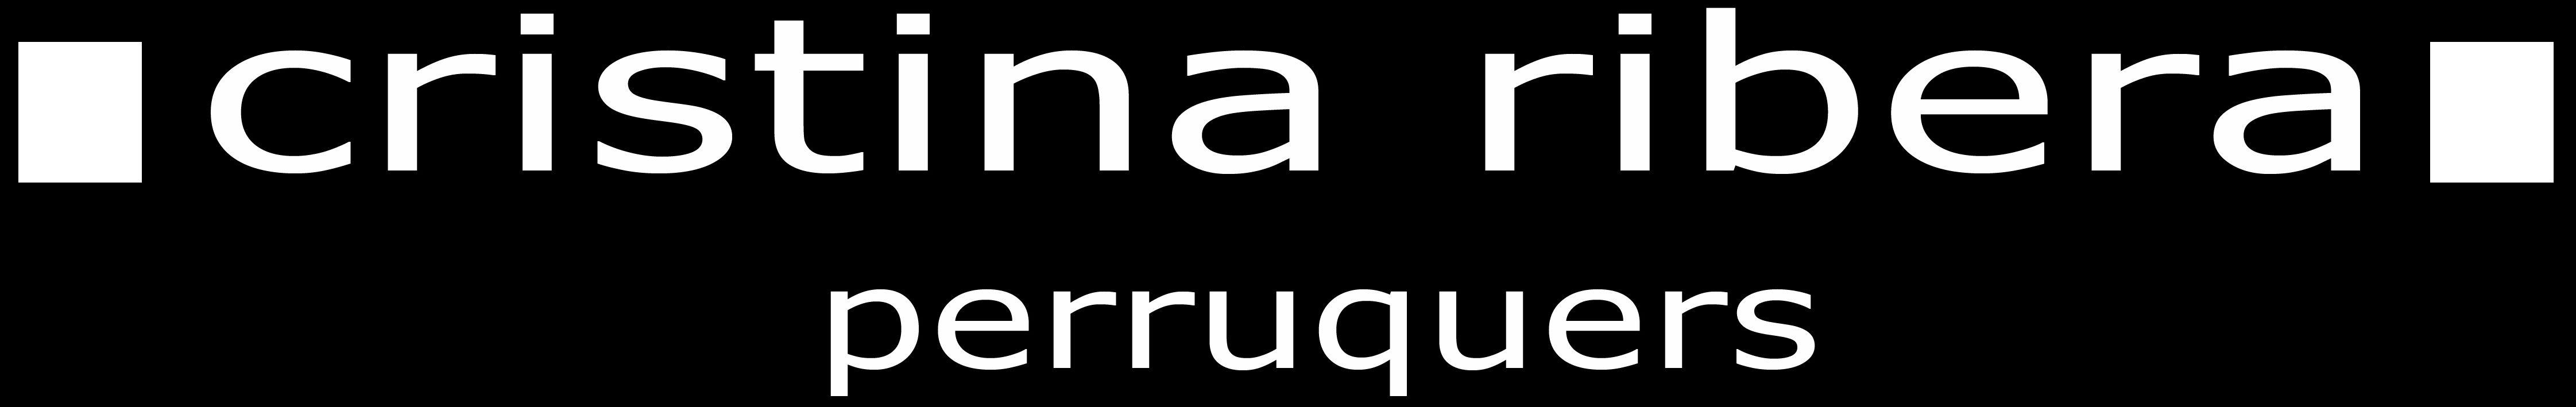 Cristina Ribera Perruquers